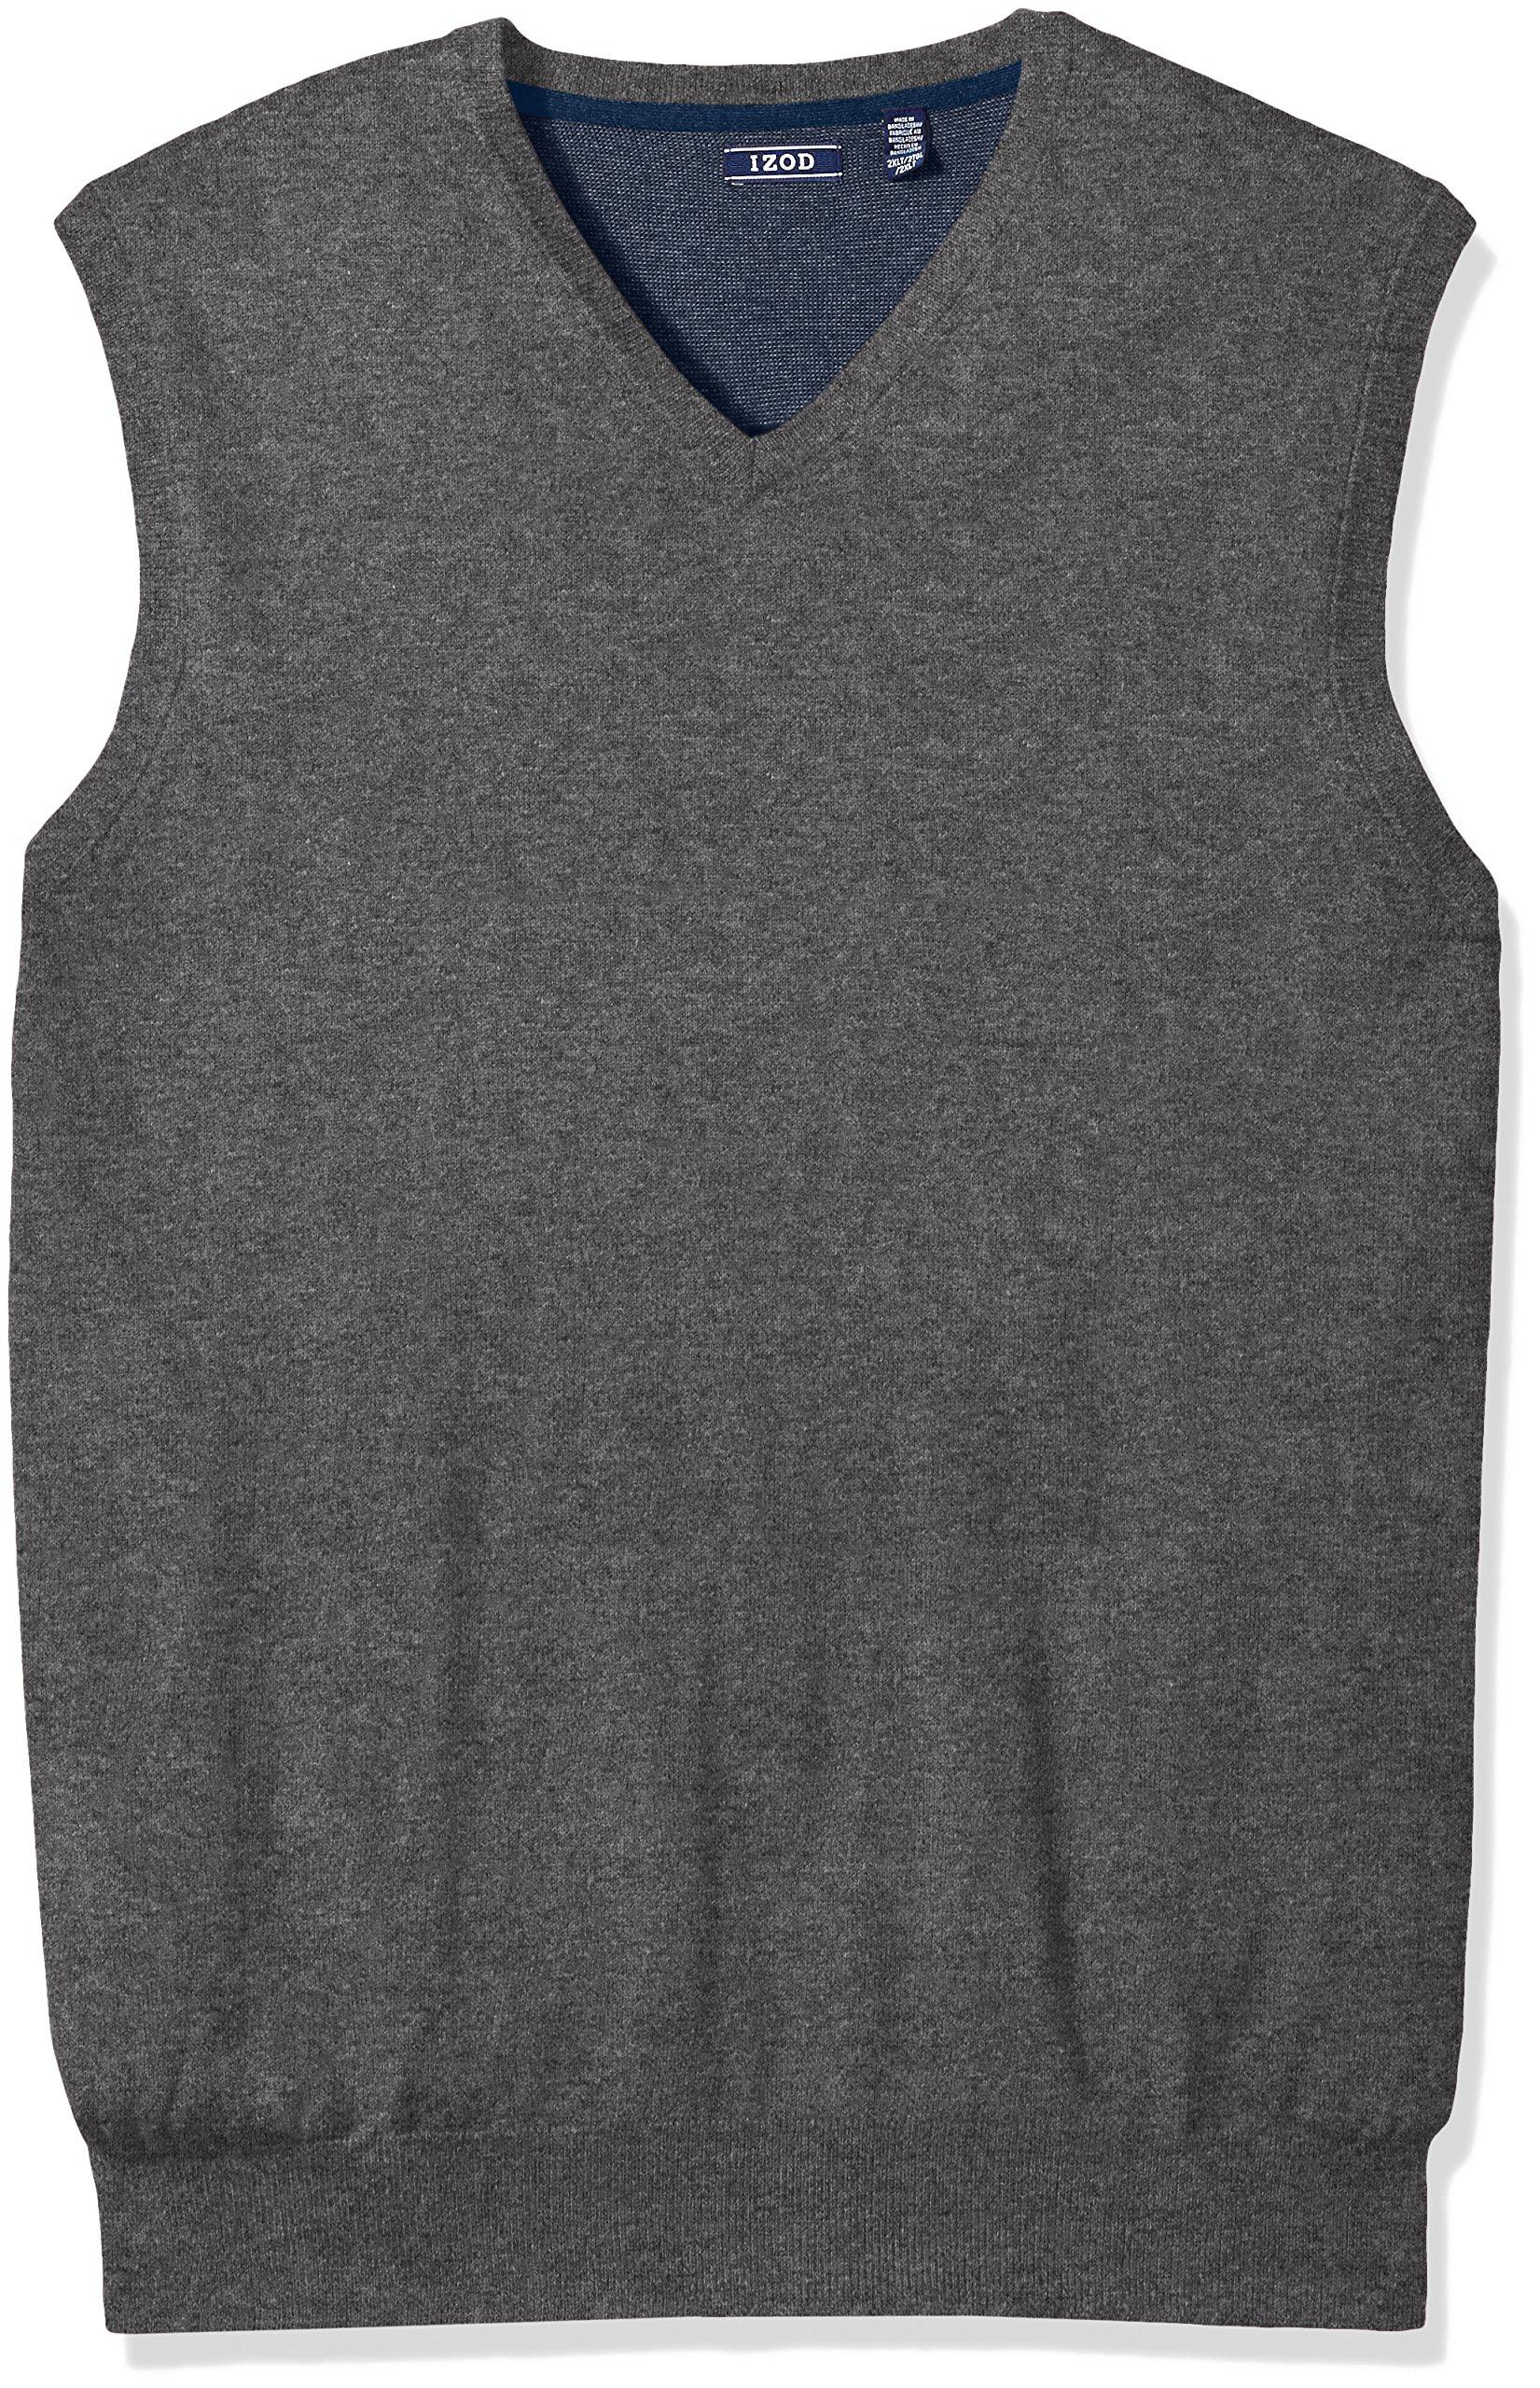 IZOD Men's Big Fine Gauge Solid Sweater Vest, Carbon Heather, X-Large Tall